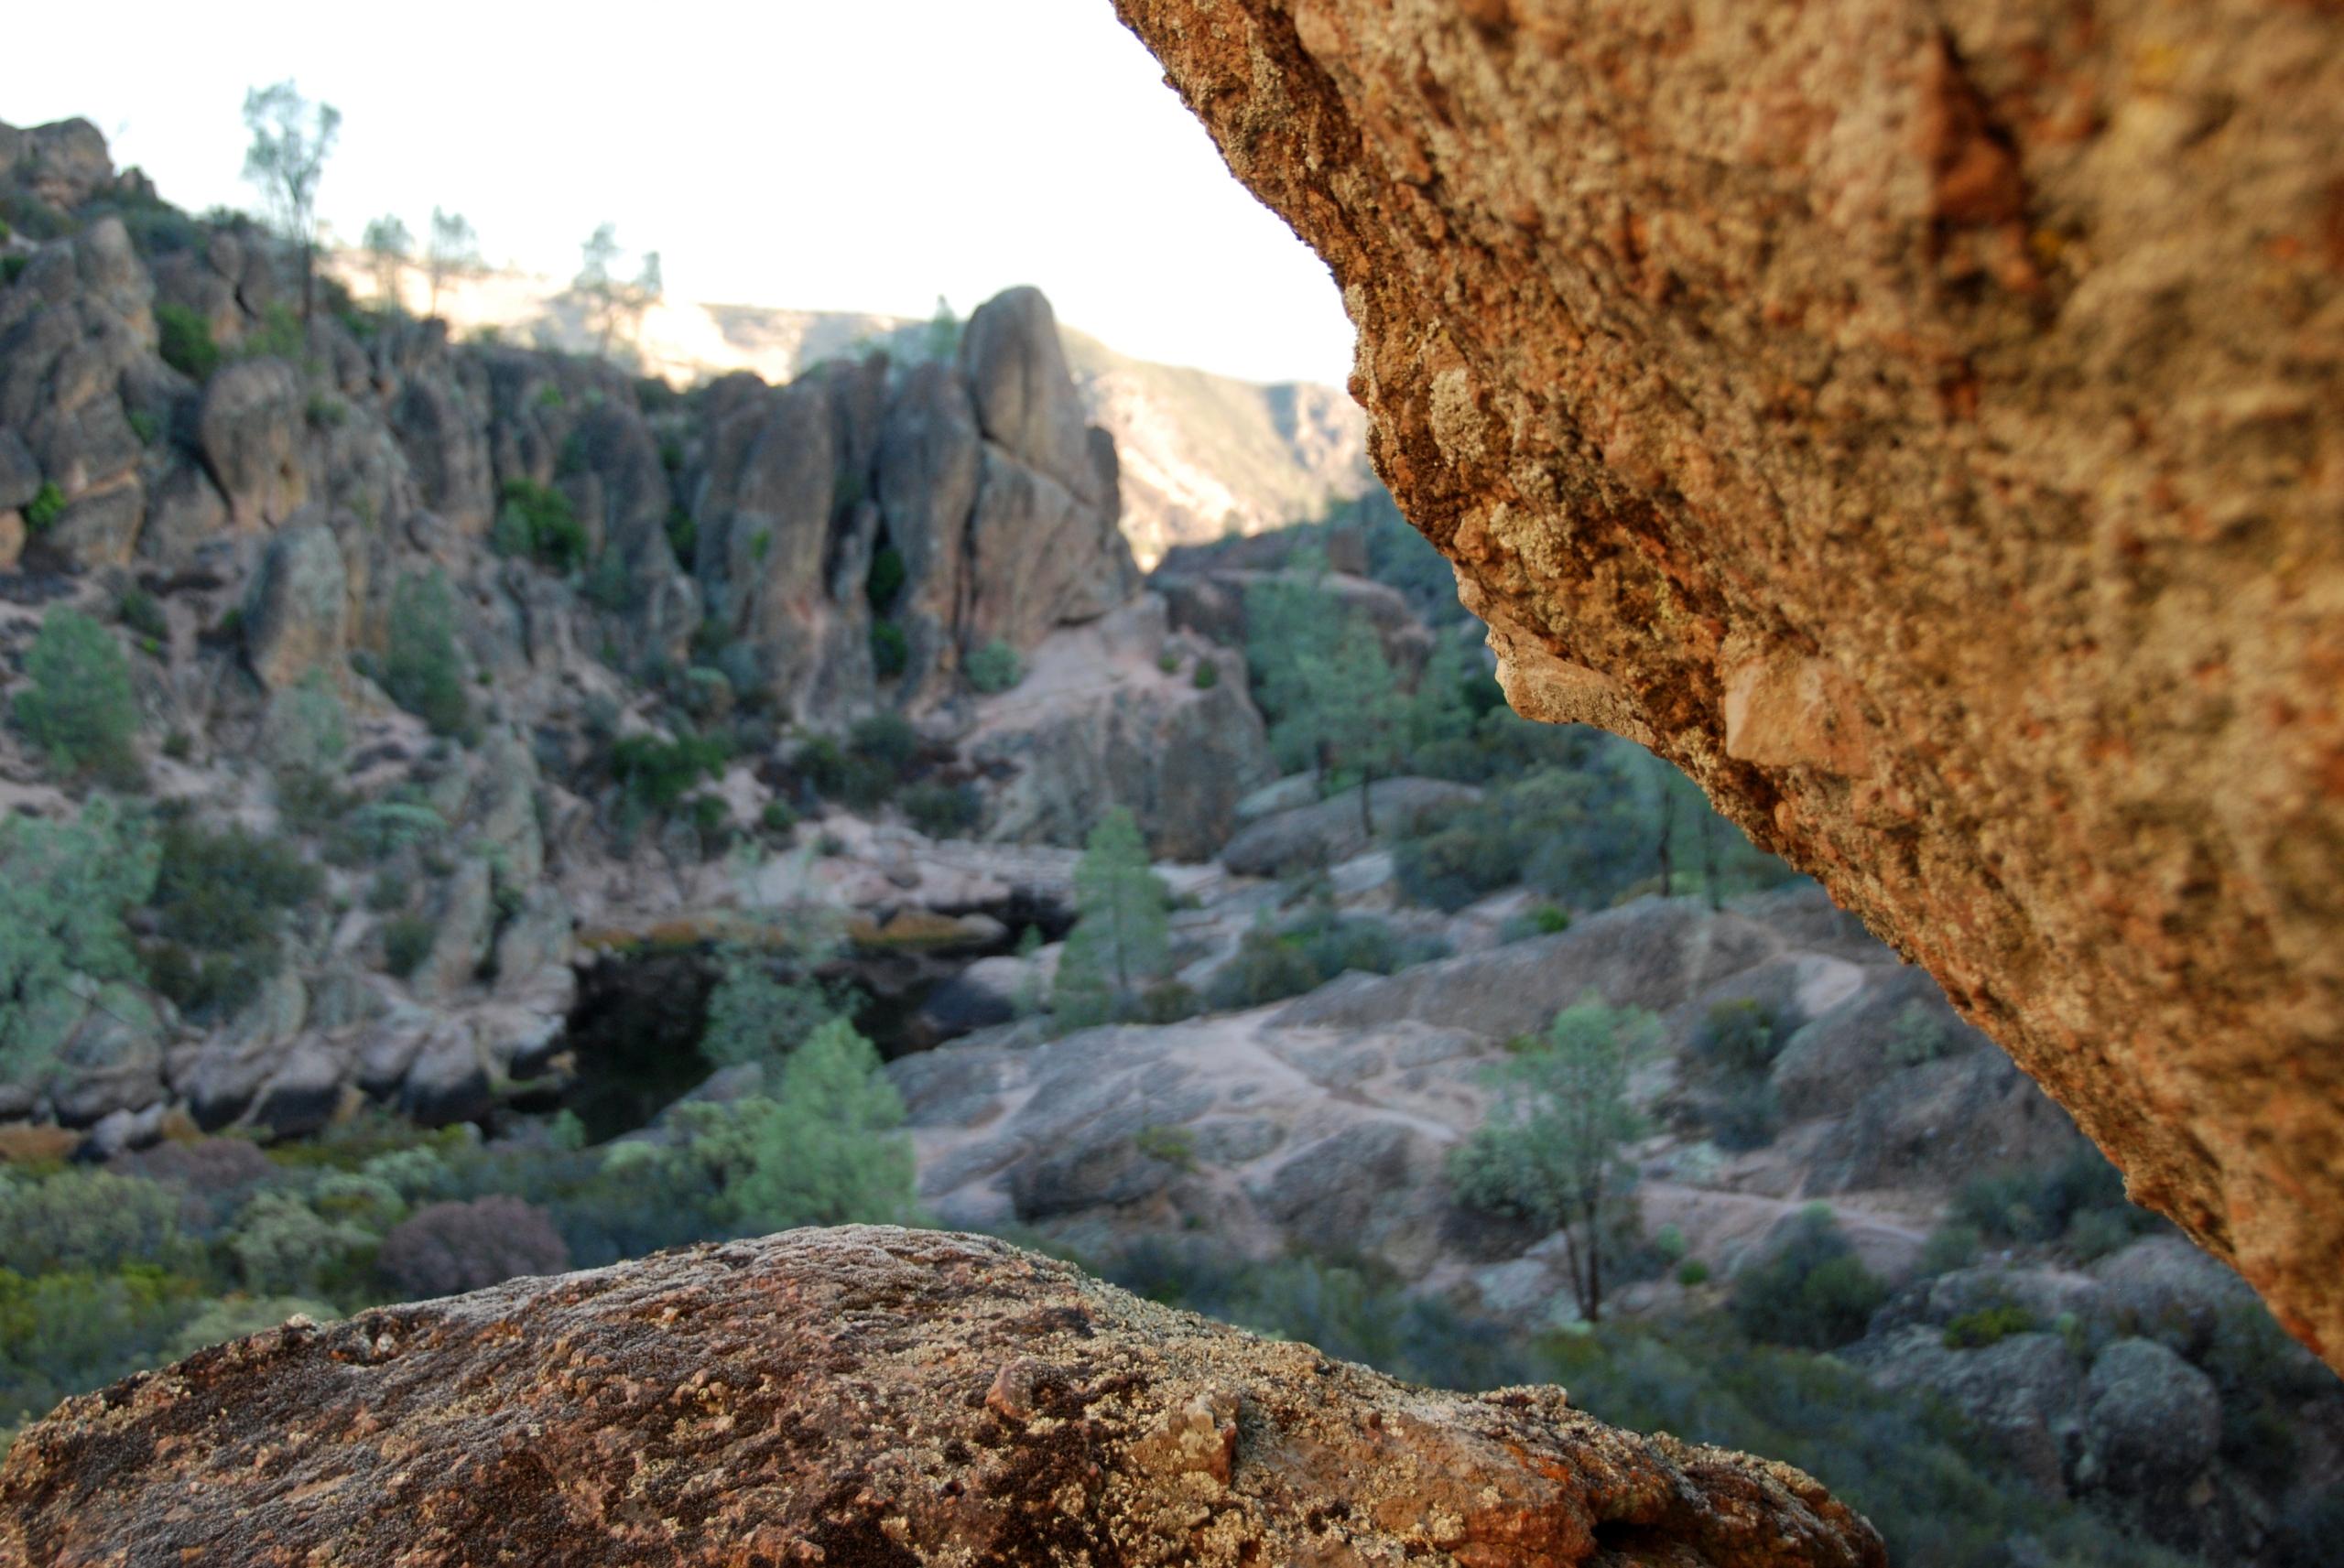 Pinnacles National Park Bat Caves Amp Vistas Shore Looks Nice